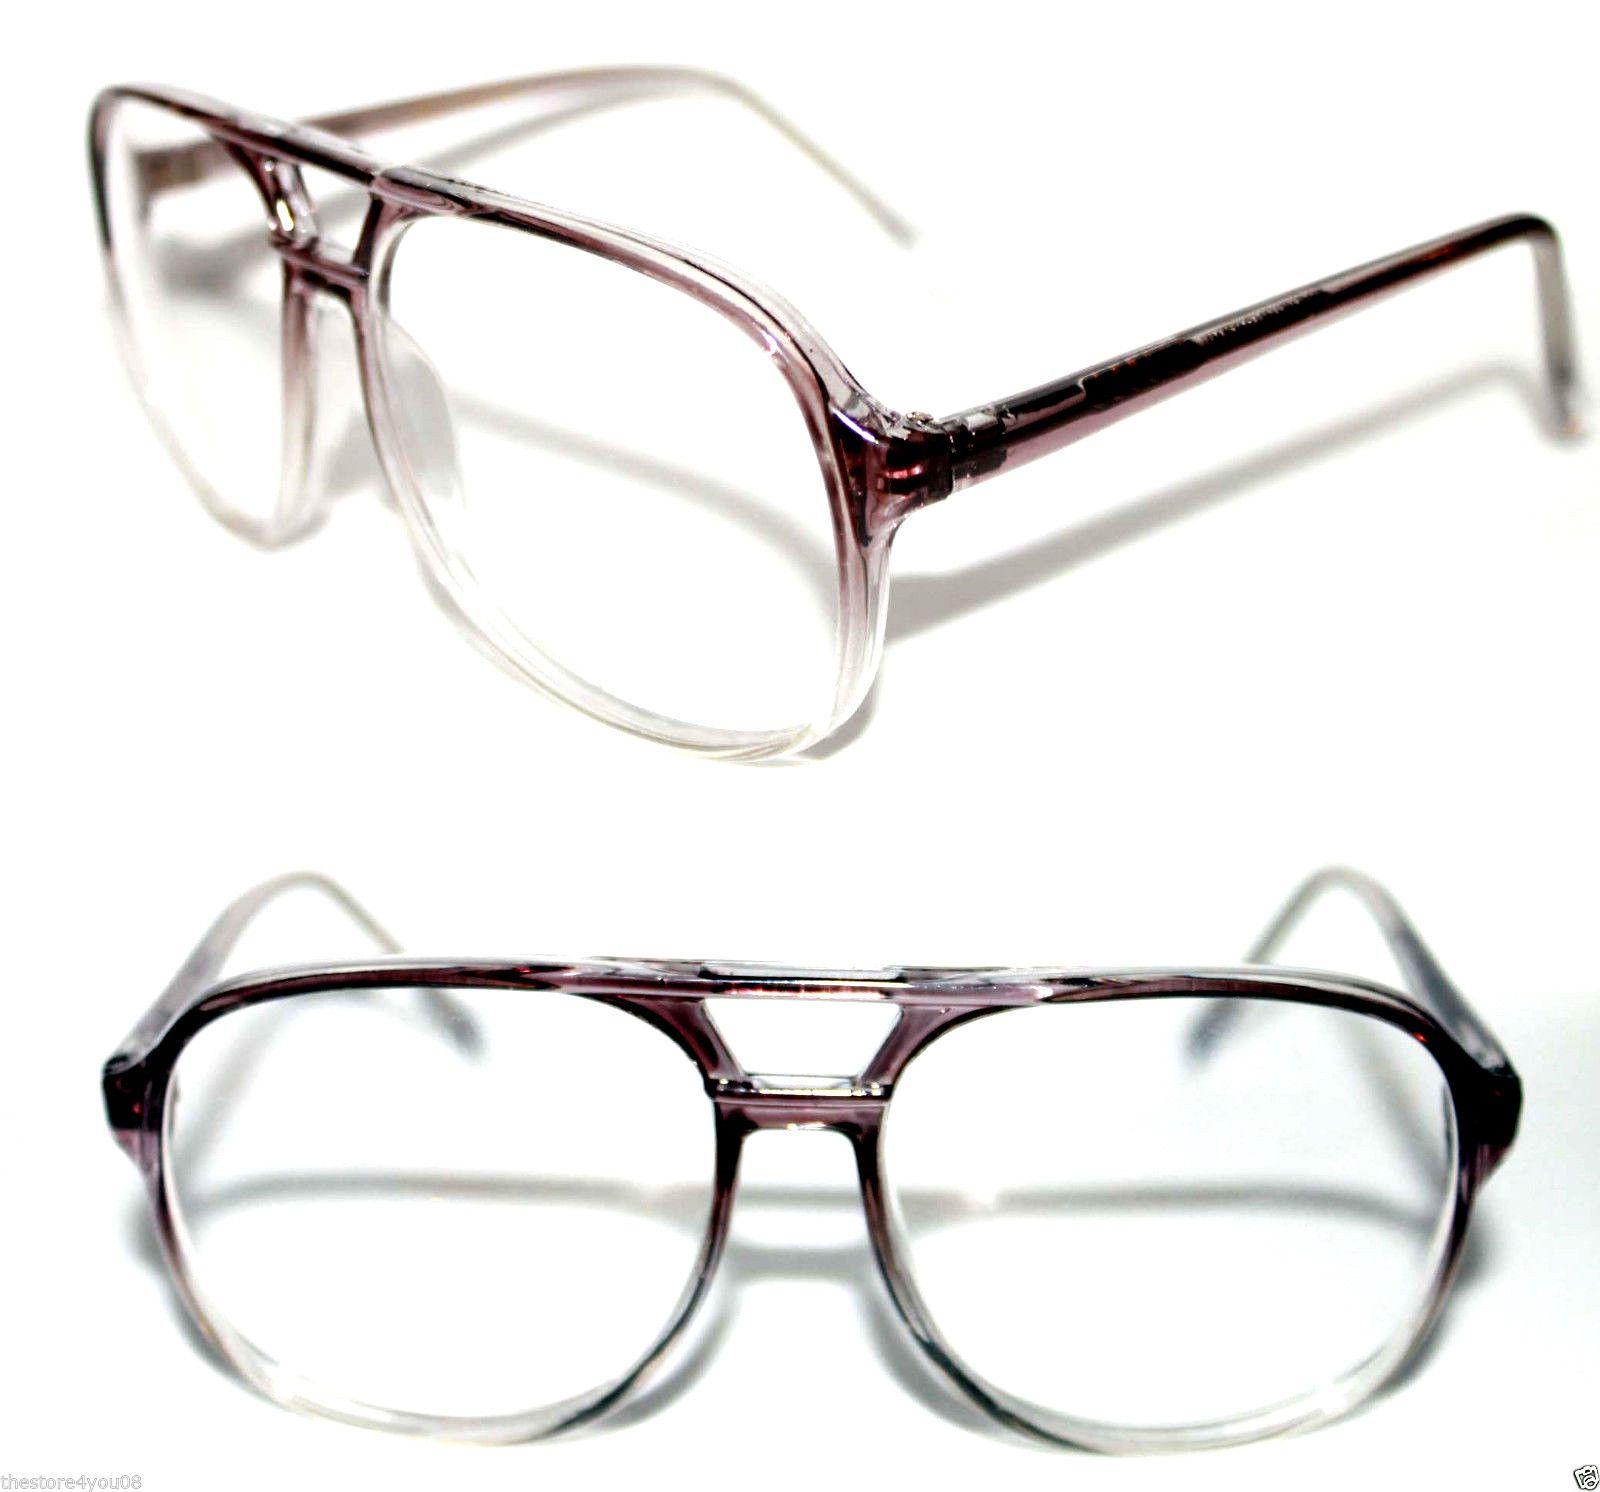 true vintage nerd aviator glasses super round shape geek brown clear super 470 ebay - Ebay Glasses Frames